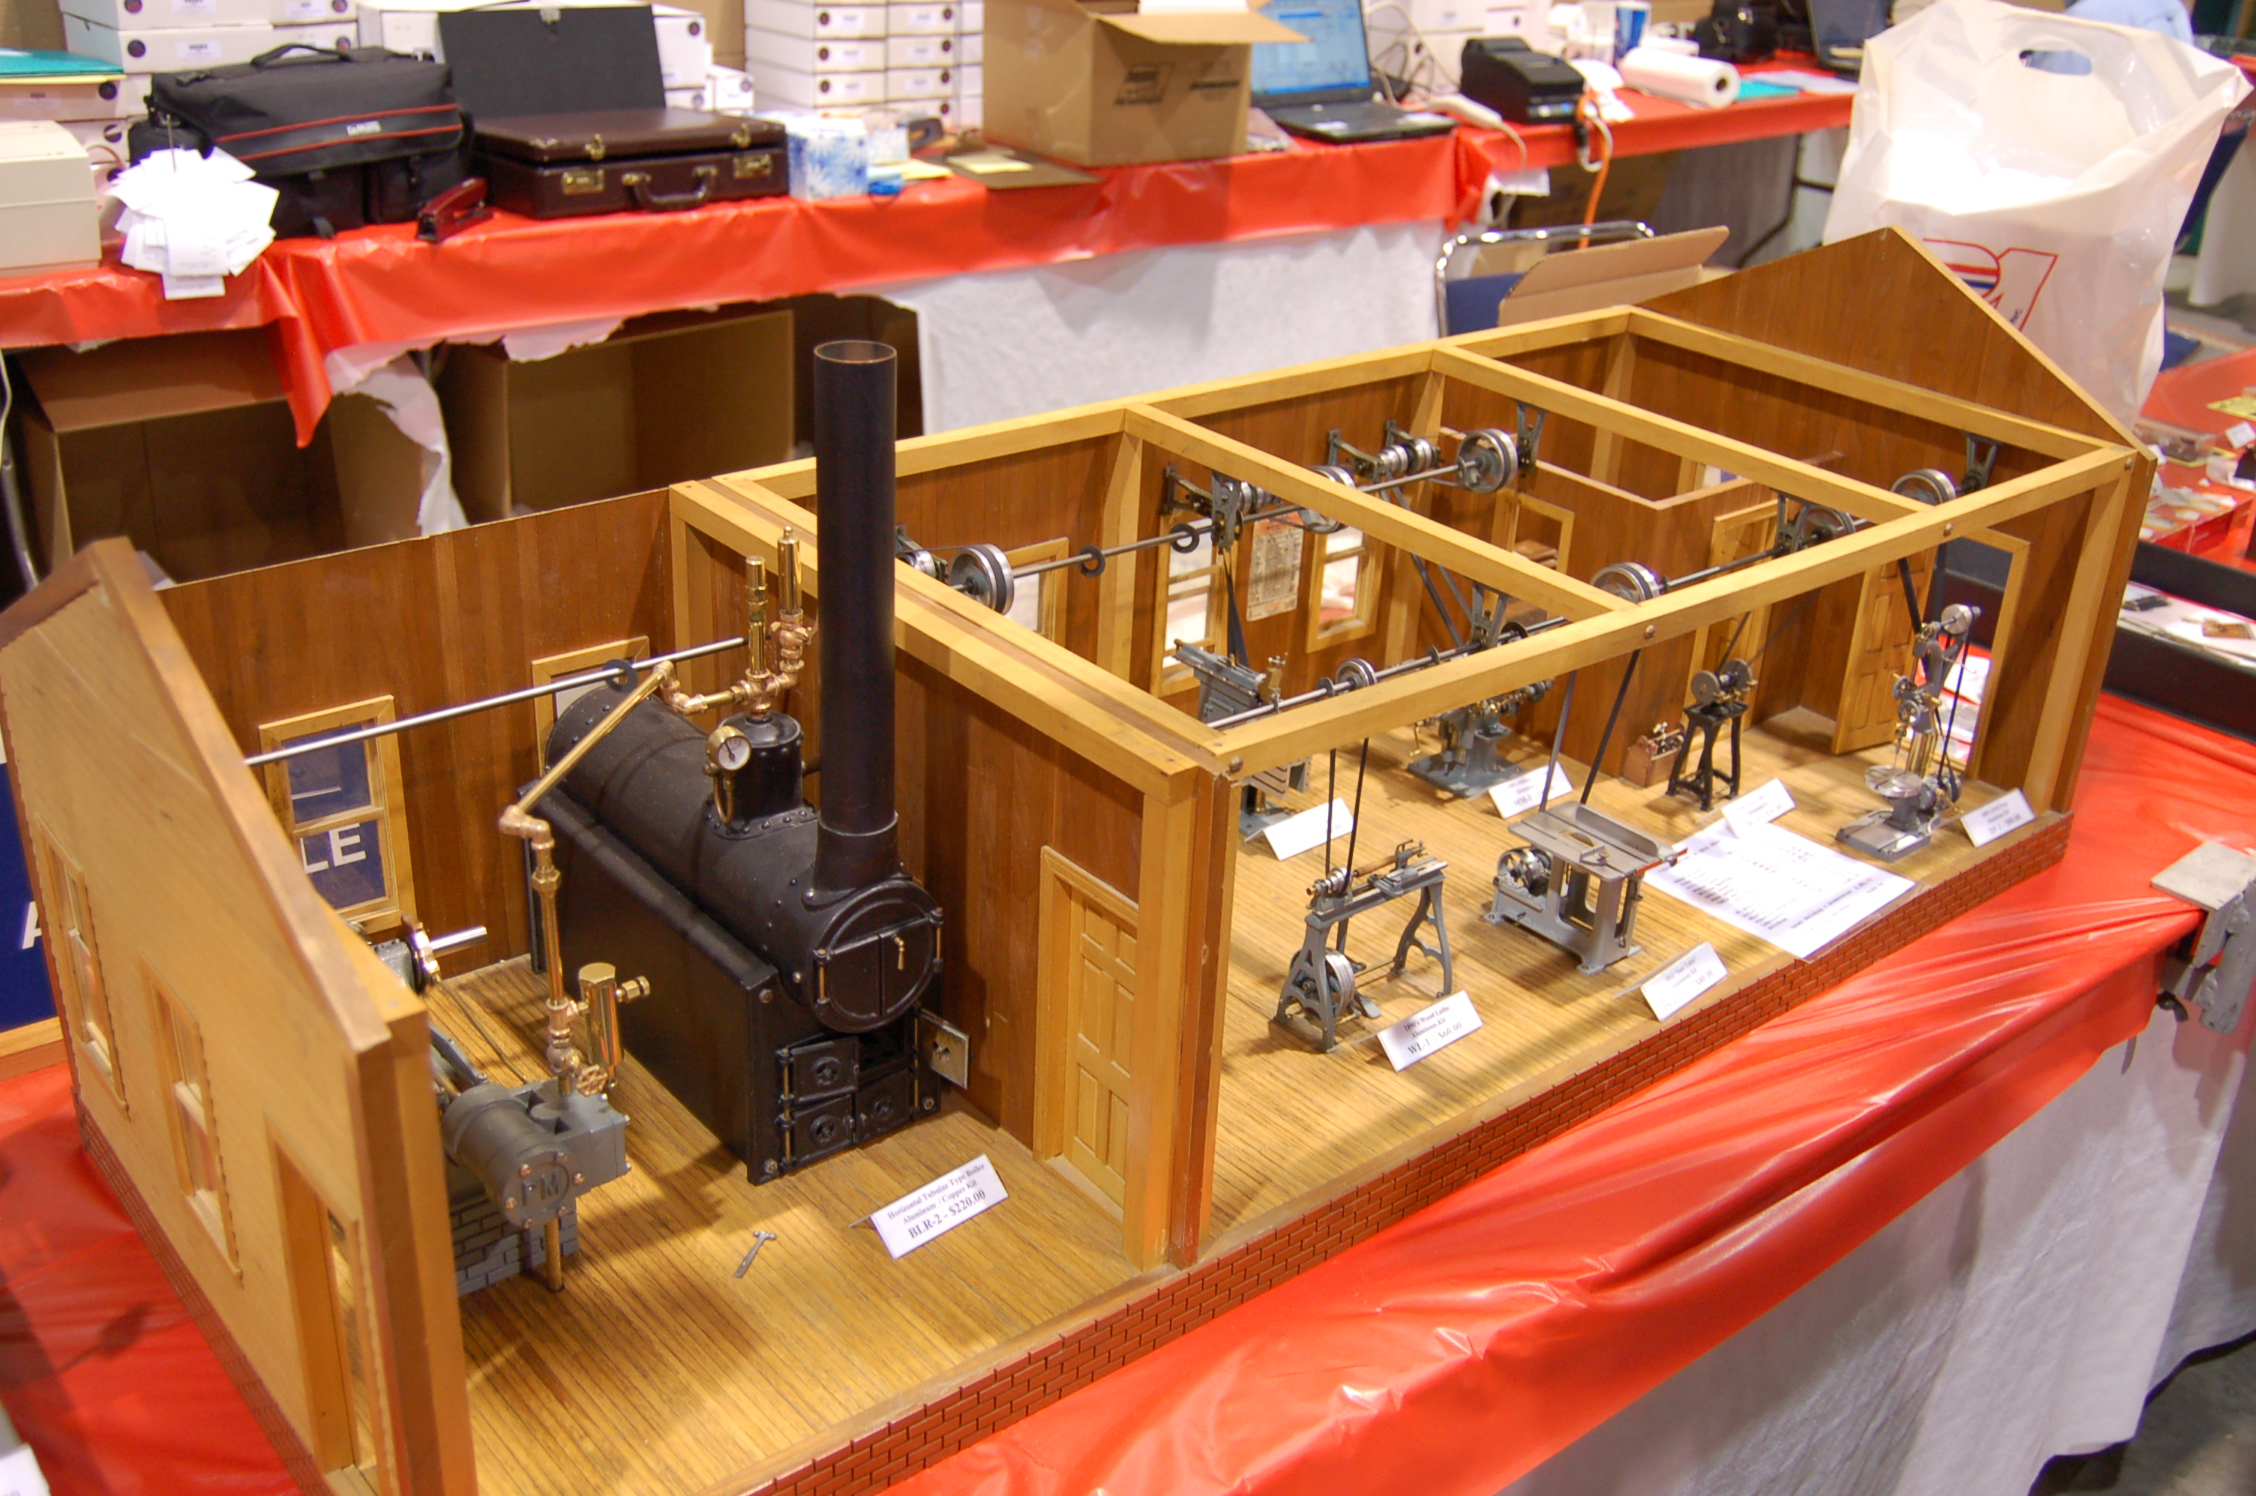 File:Miniature Machine Shop powered by Steam Boiler - 2008 North